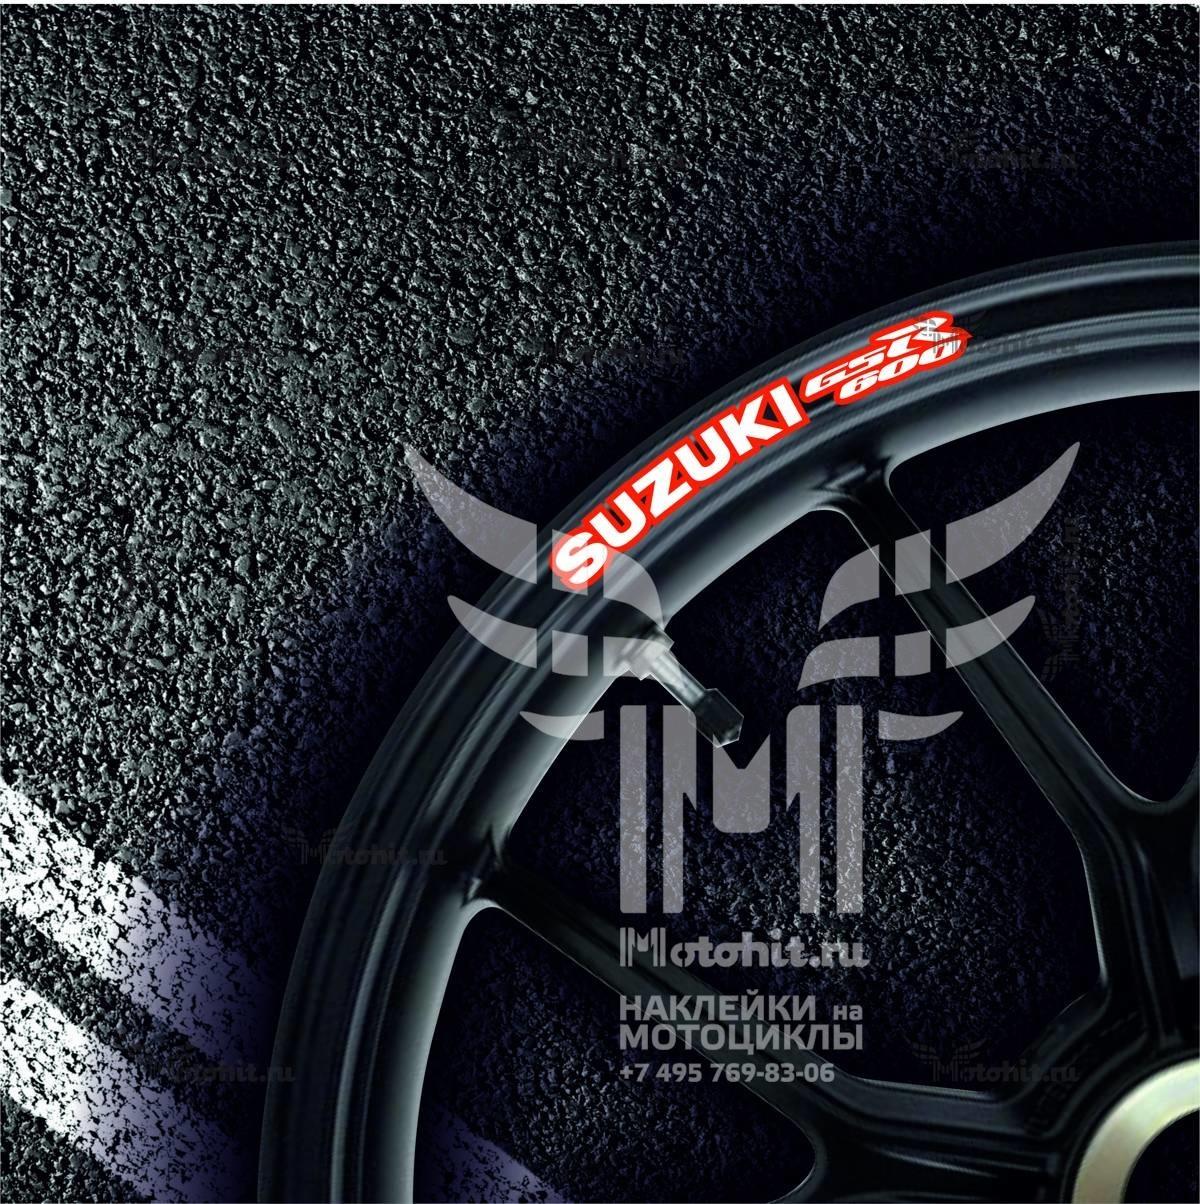 Комплект наклеек на обод колеса мотоцикла SUZUKI GSR-600